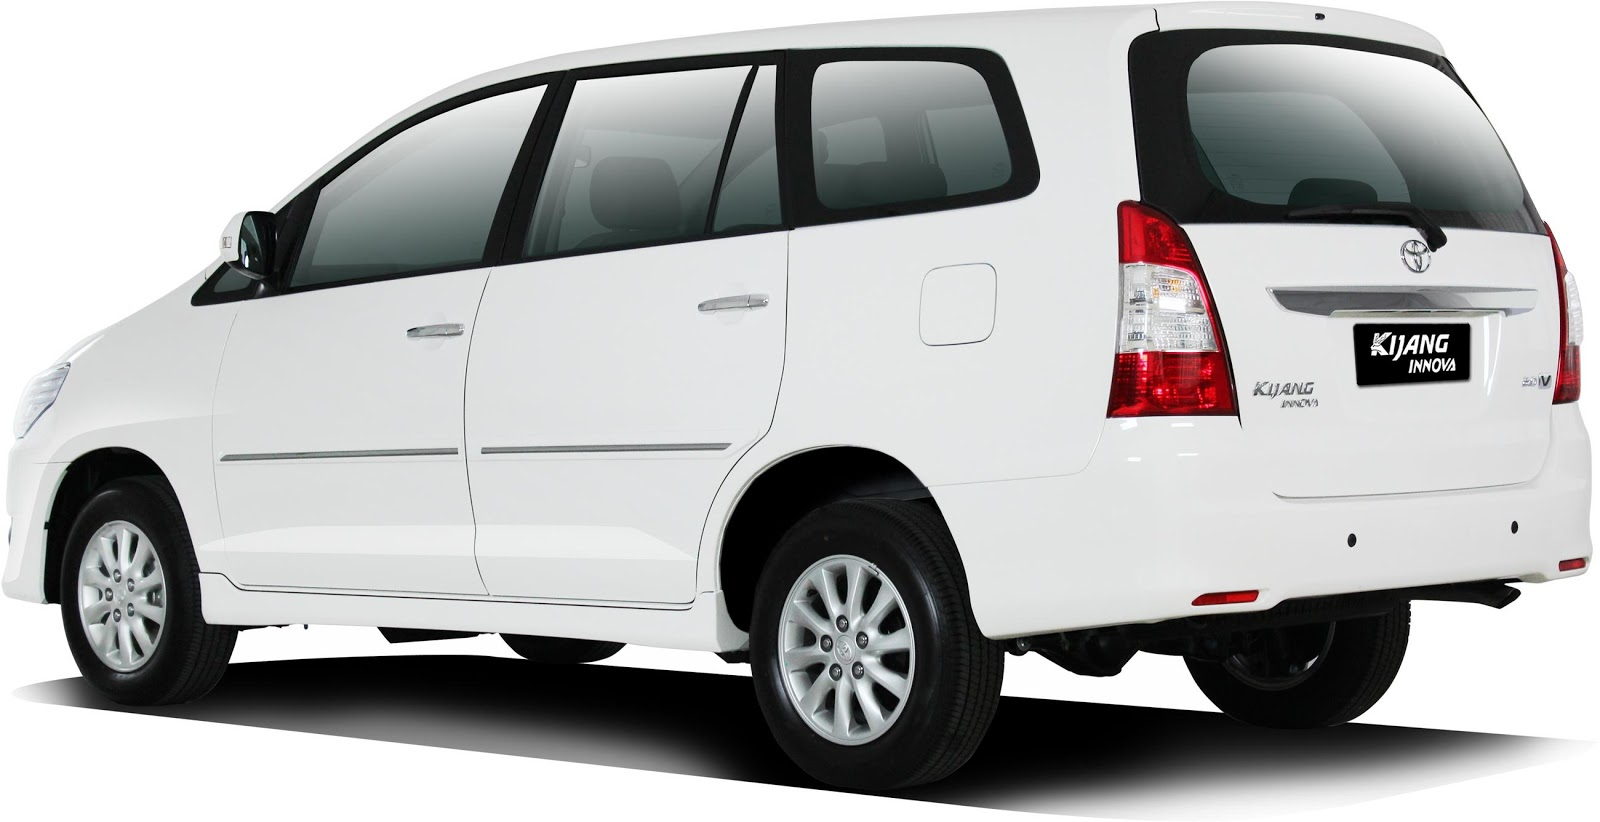 DIKTA'S BLOG: Gerbang Informasi Harga Toyota Surabaya: Grand New ...